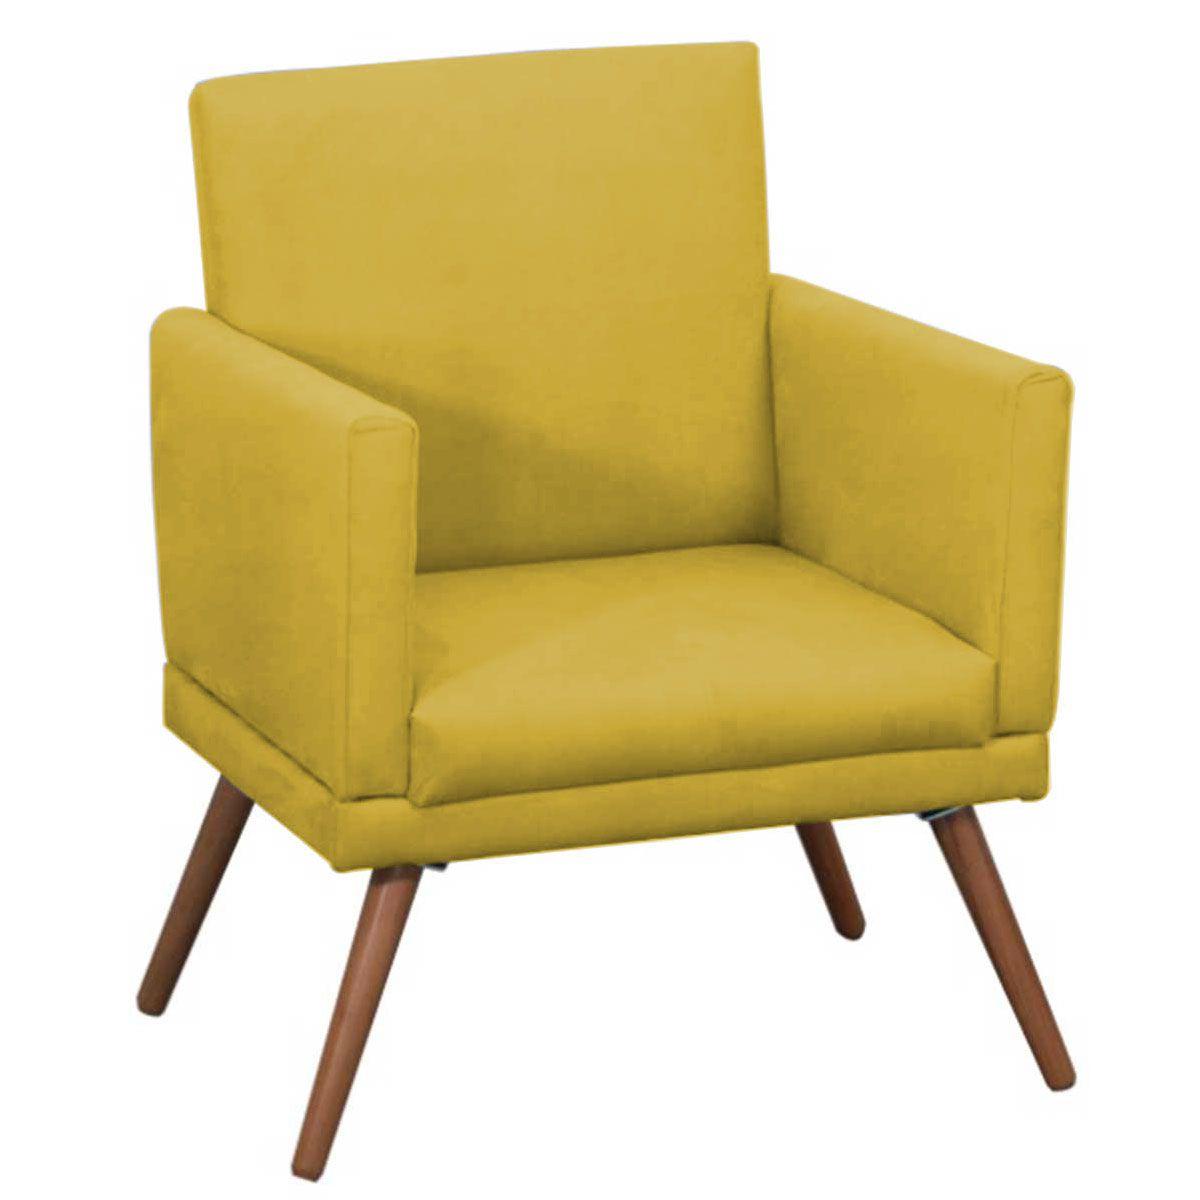 Poltrona Decorativa New Nina Luxo Pé Palito Tecido Amarelo